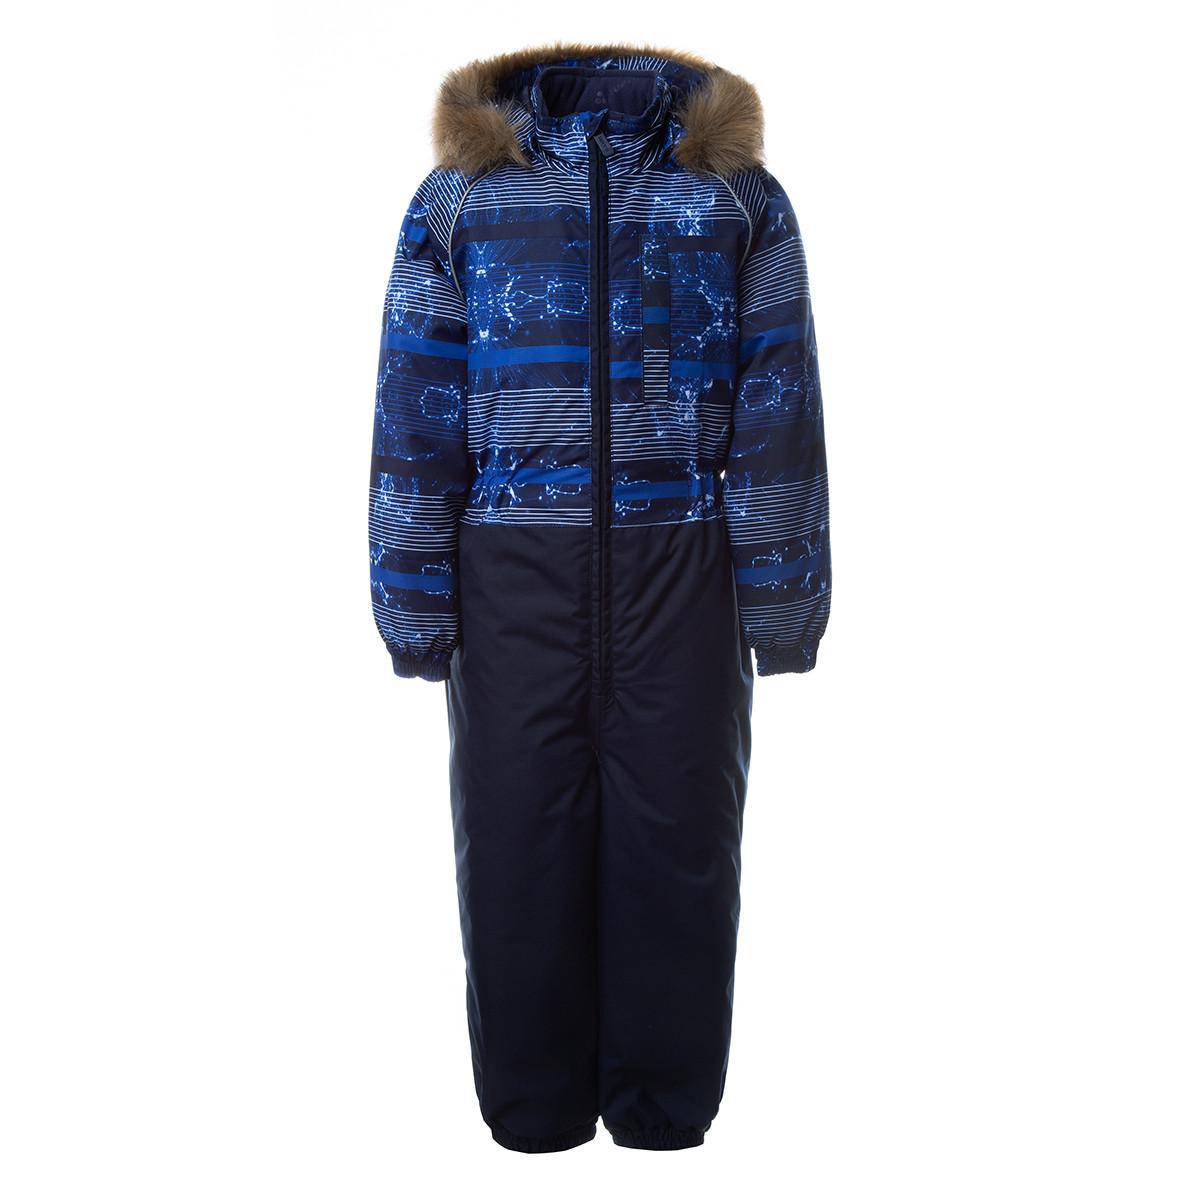 Детский комбинезон Huppa WILLY,  синий с принтом/тёмно-синий